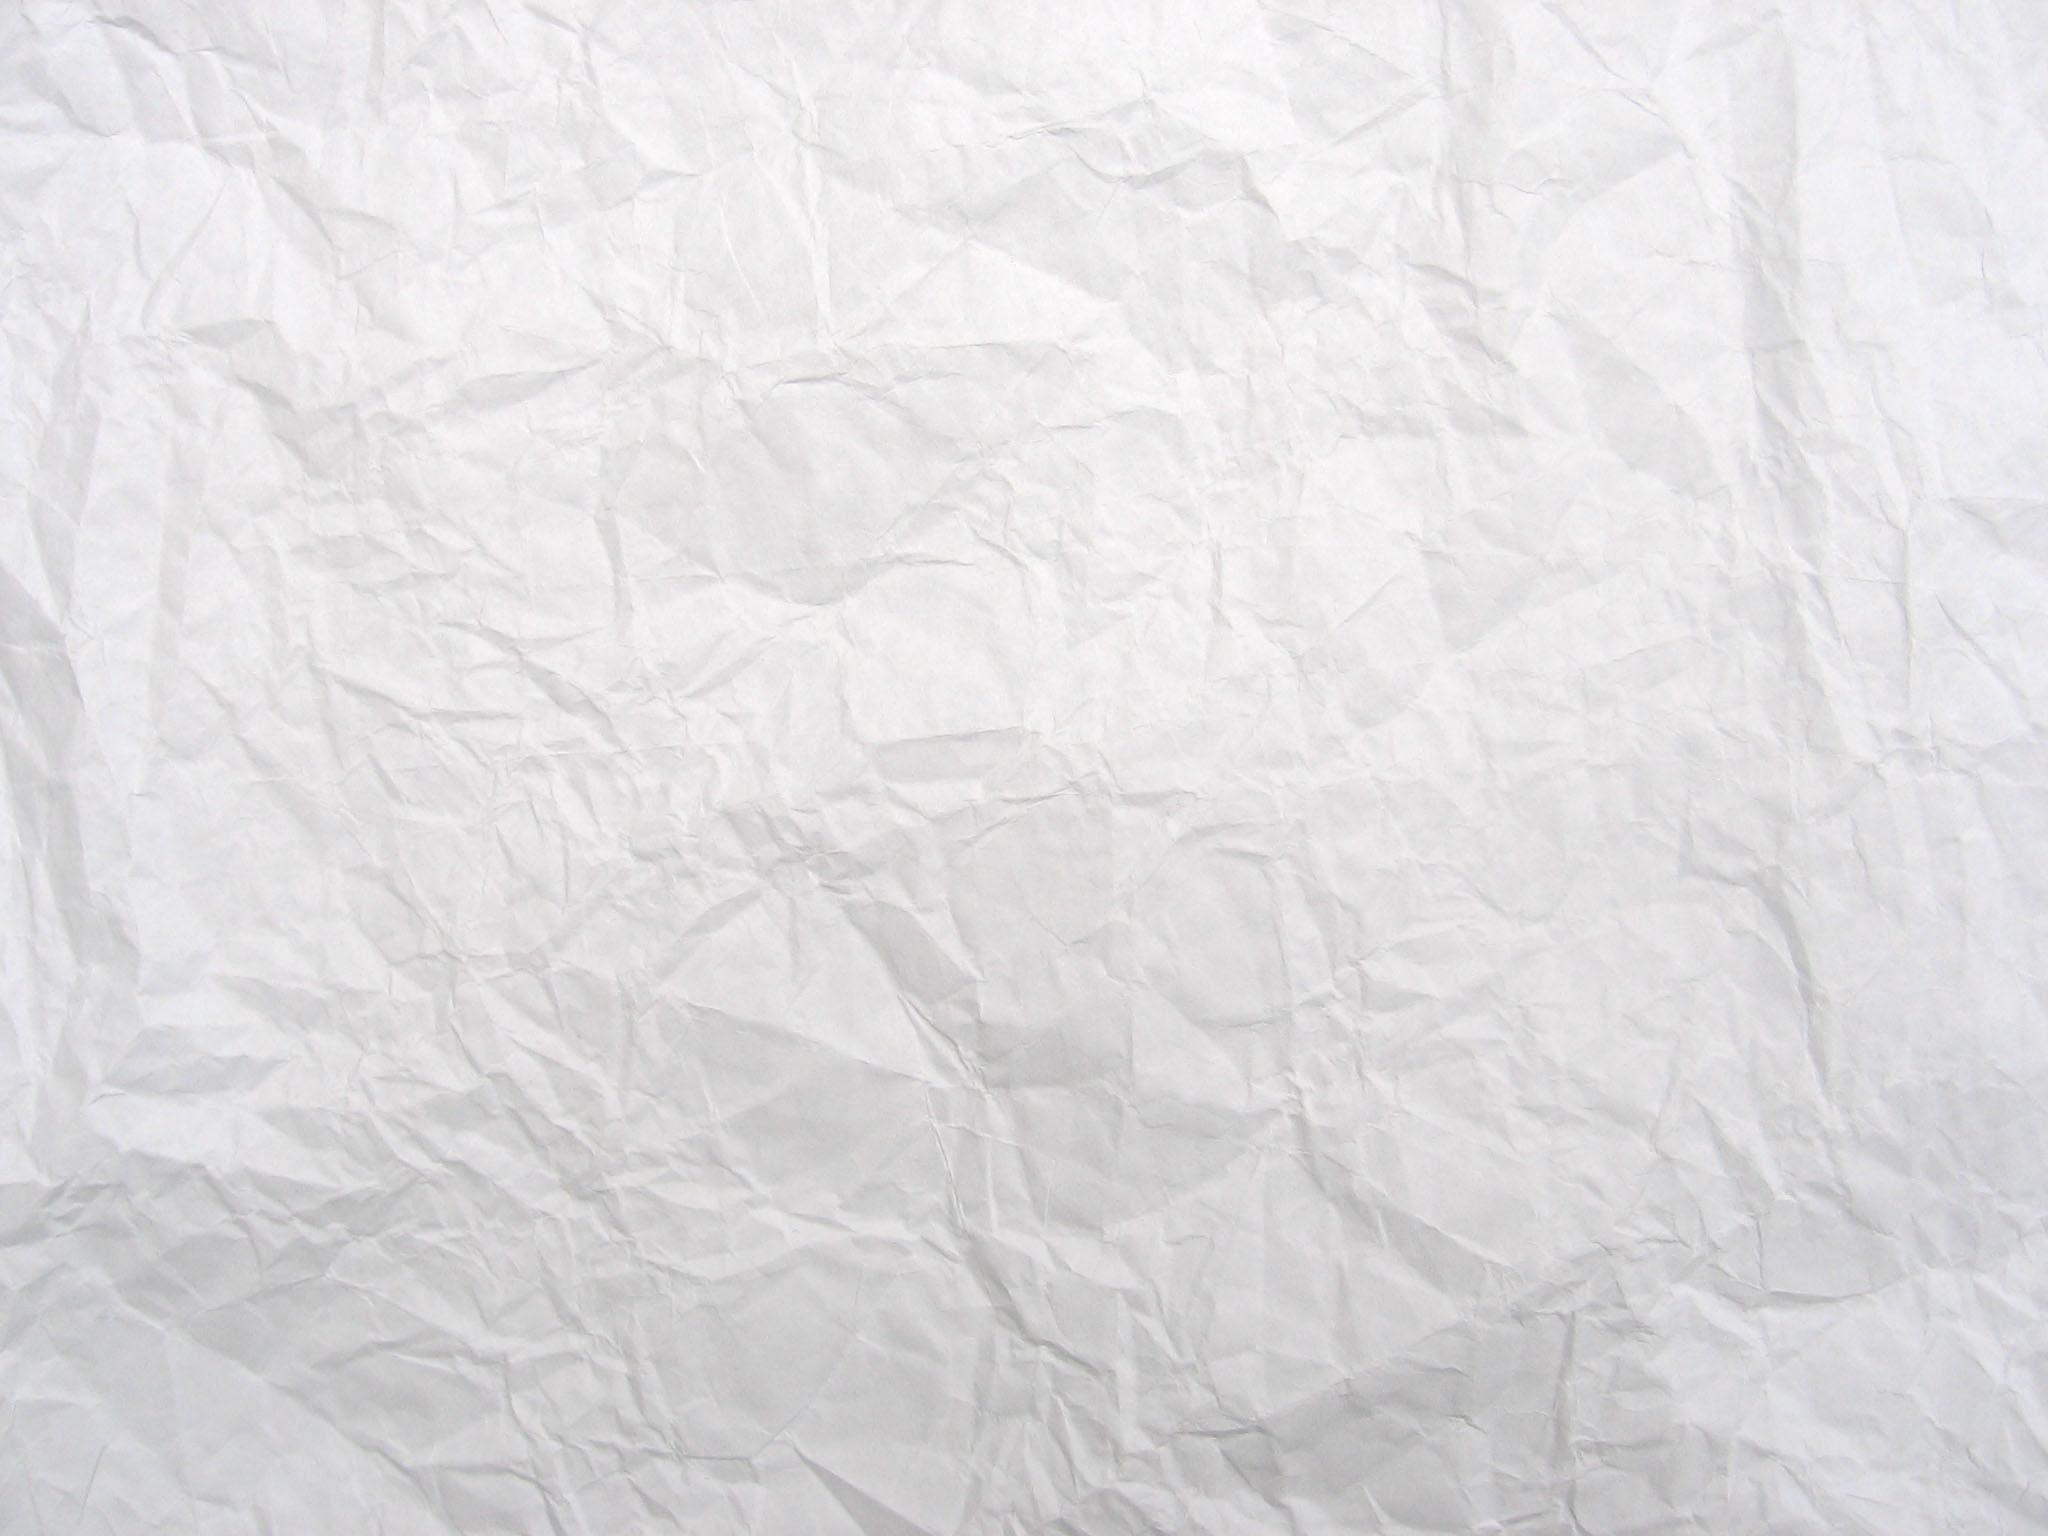 crumpled paper texture wallpaper 49223 2048x1536 px